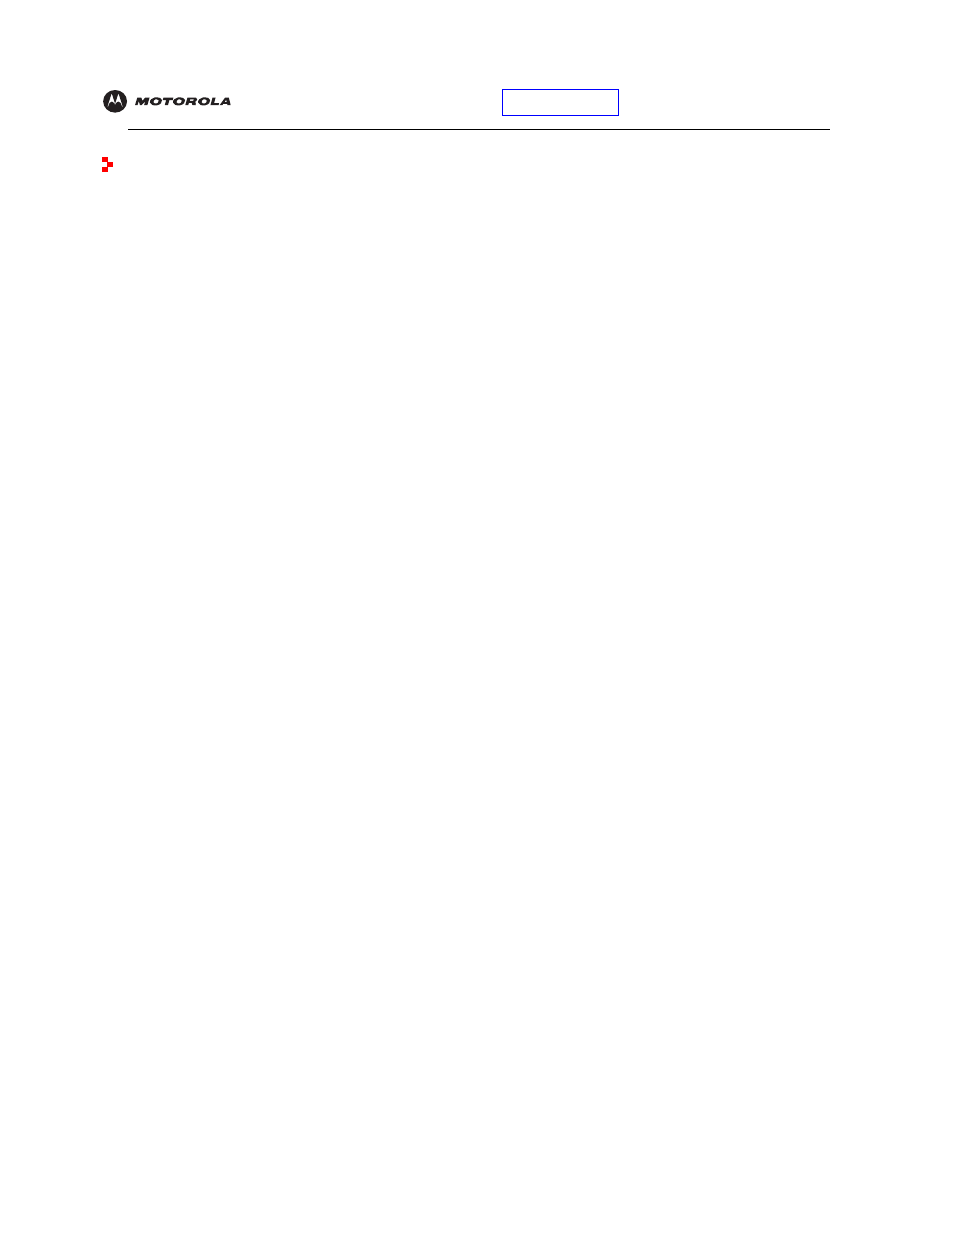 Cable modem motorola sbv5121 user guide   installation (computer.